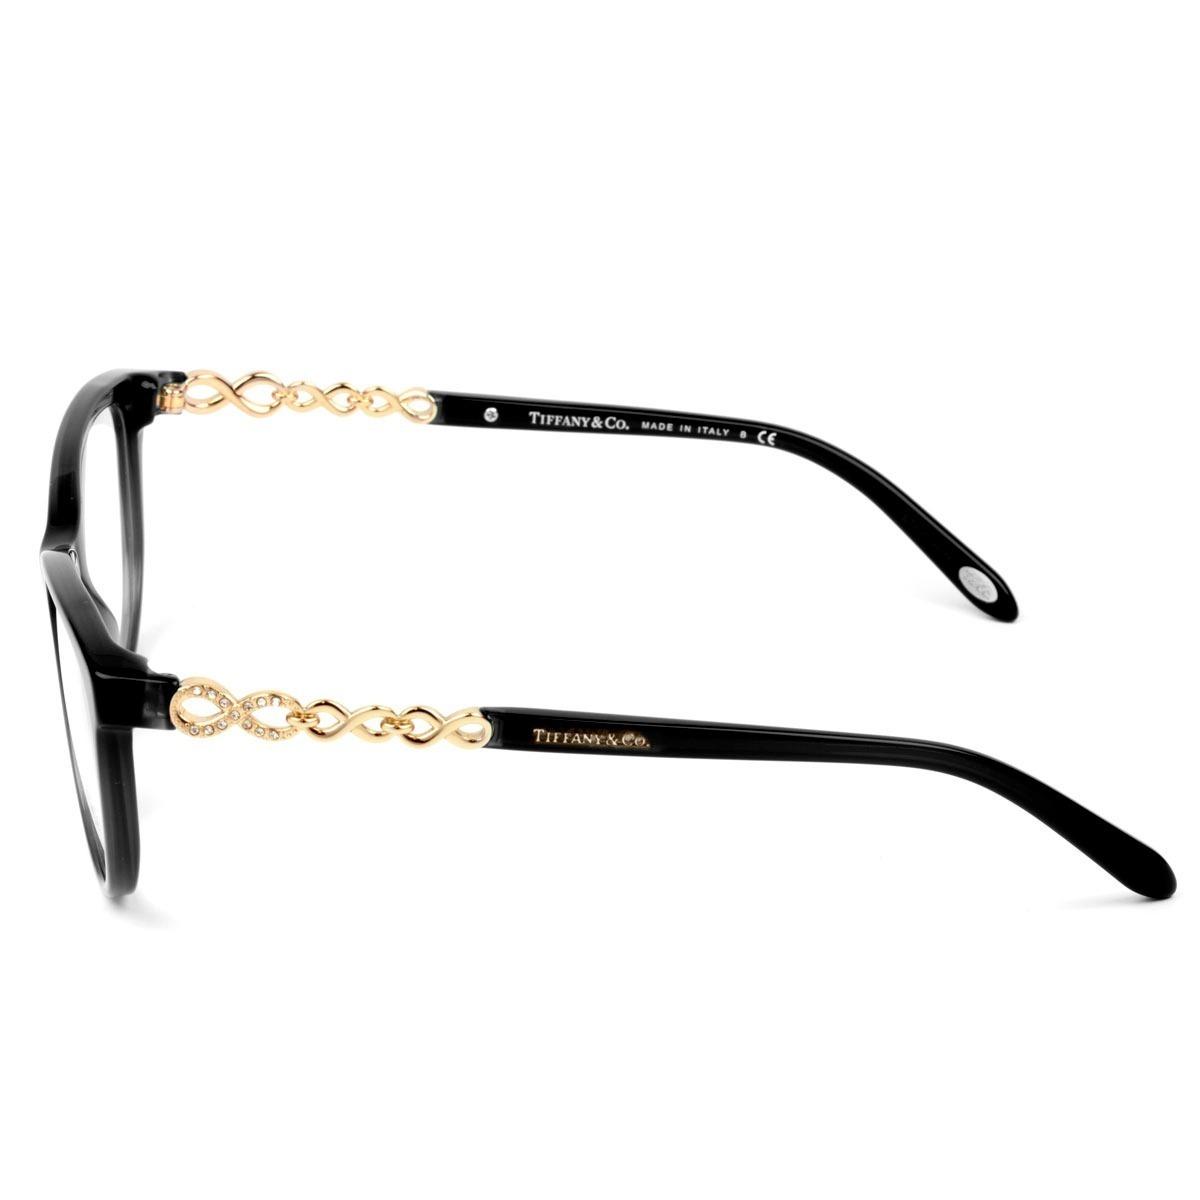 armação de grau tiffany   co. infinito tf2120-b oculos. Carregando zoom... armação  tiffany oculos. Carregando zoom. 62480c75cf